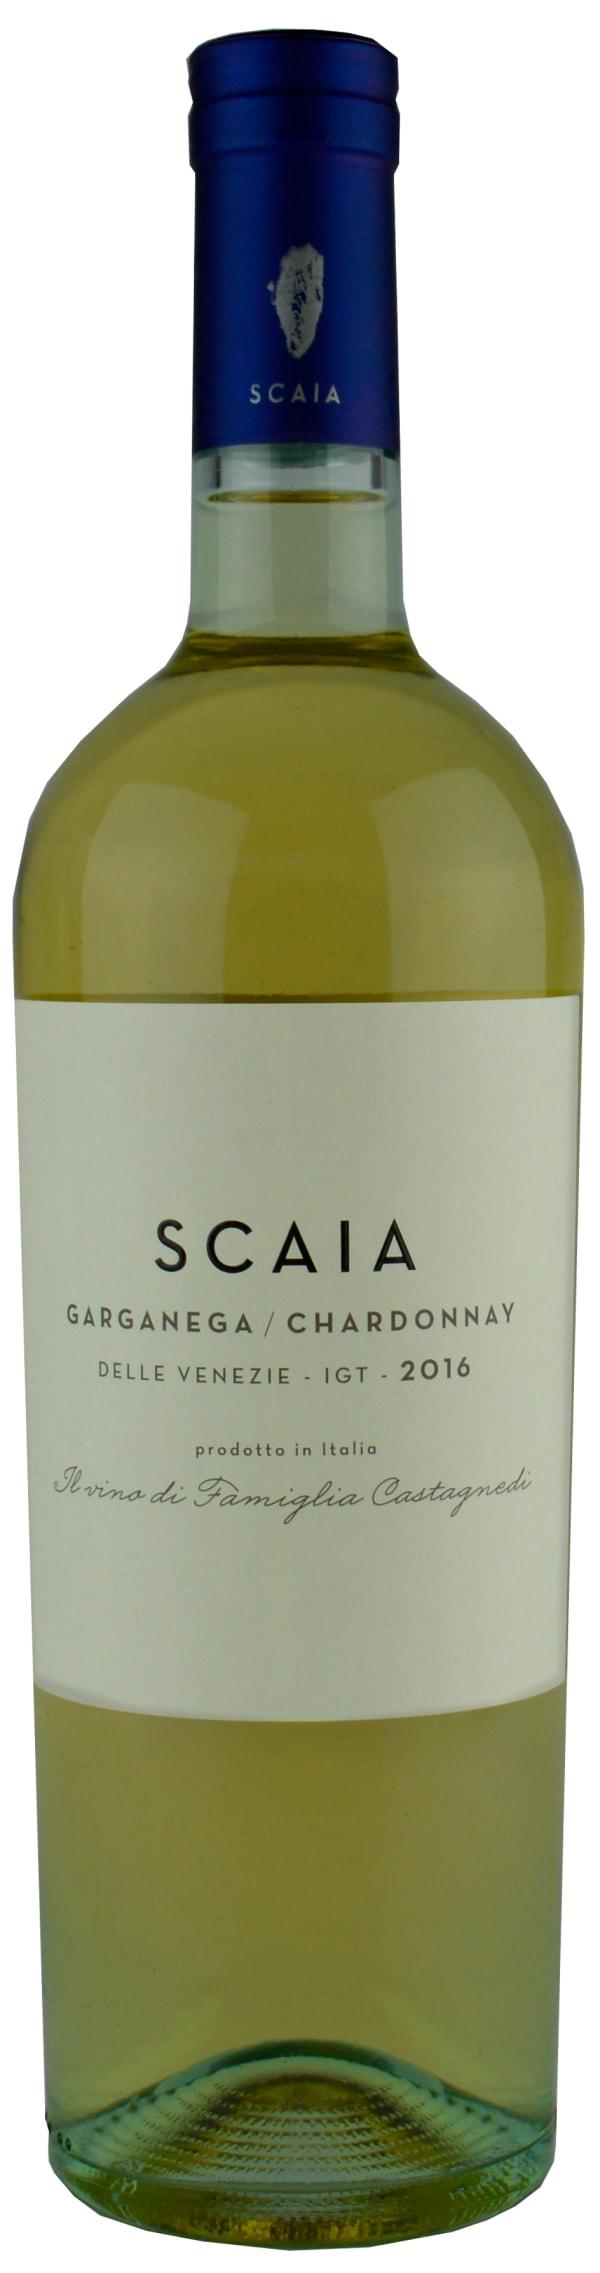 Scaia Garganega Chardonnay 2016